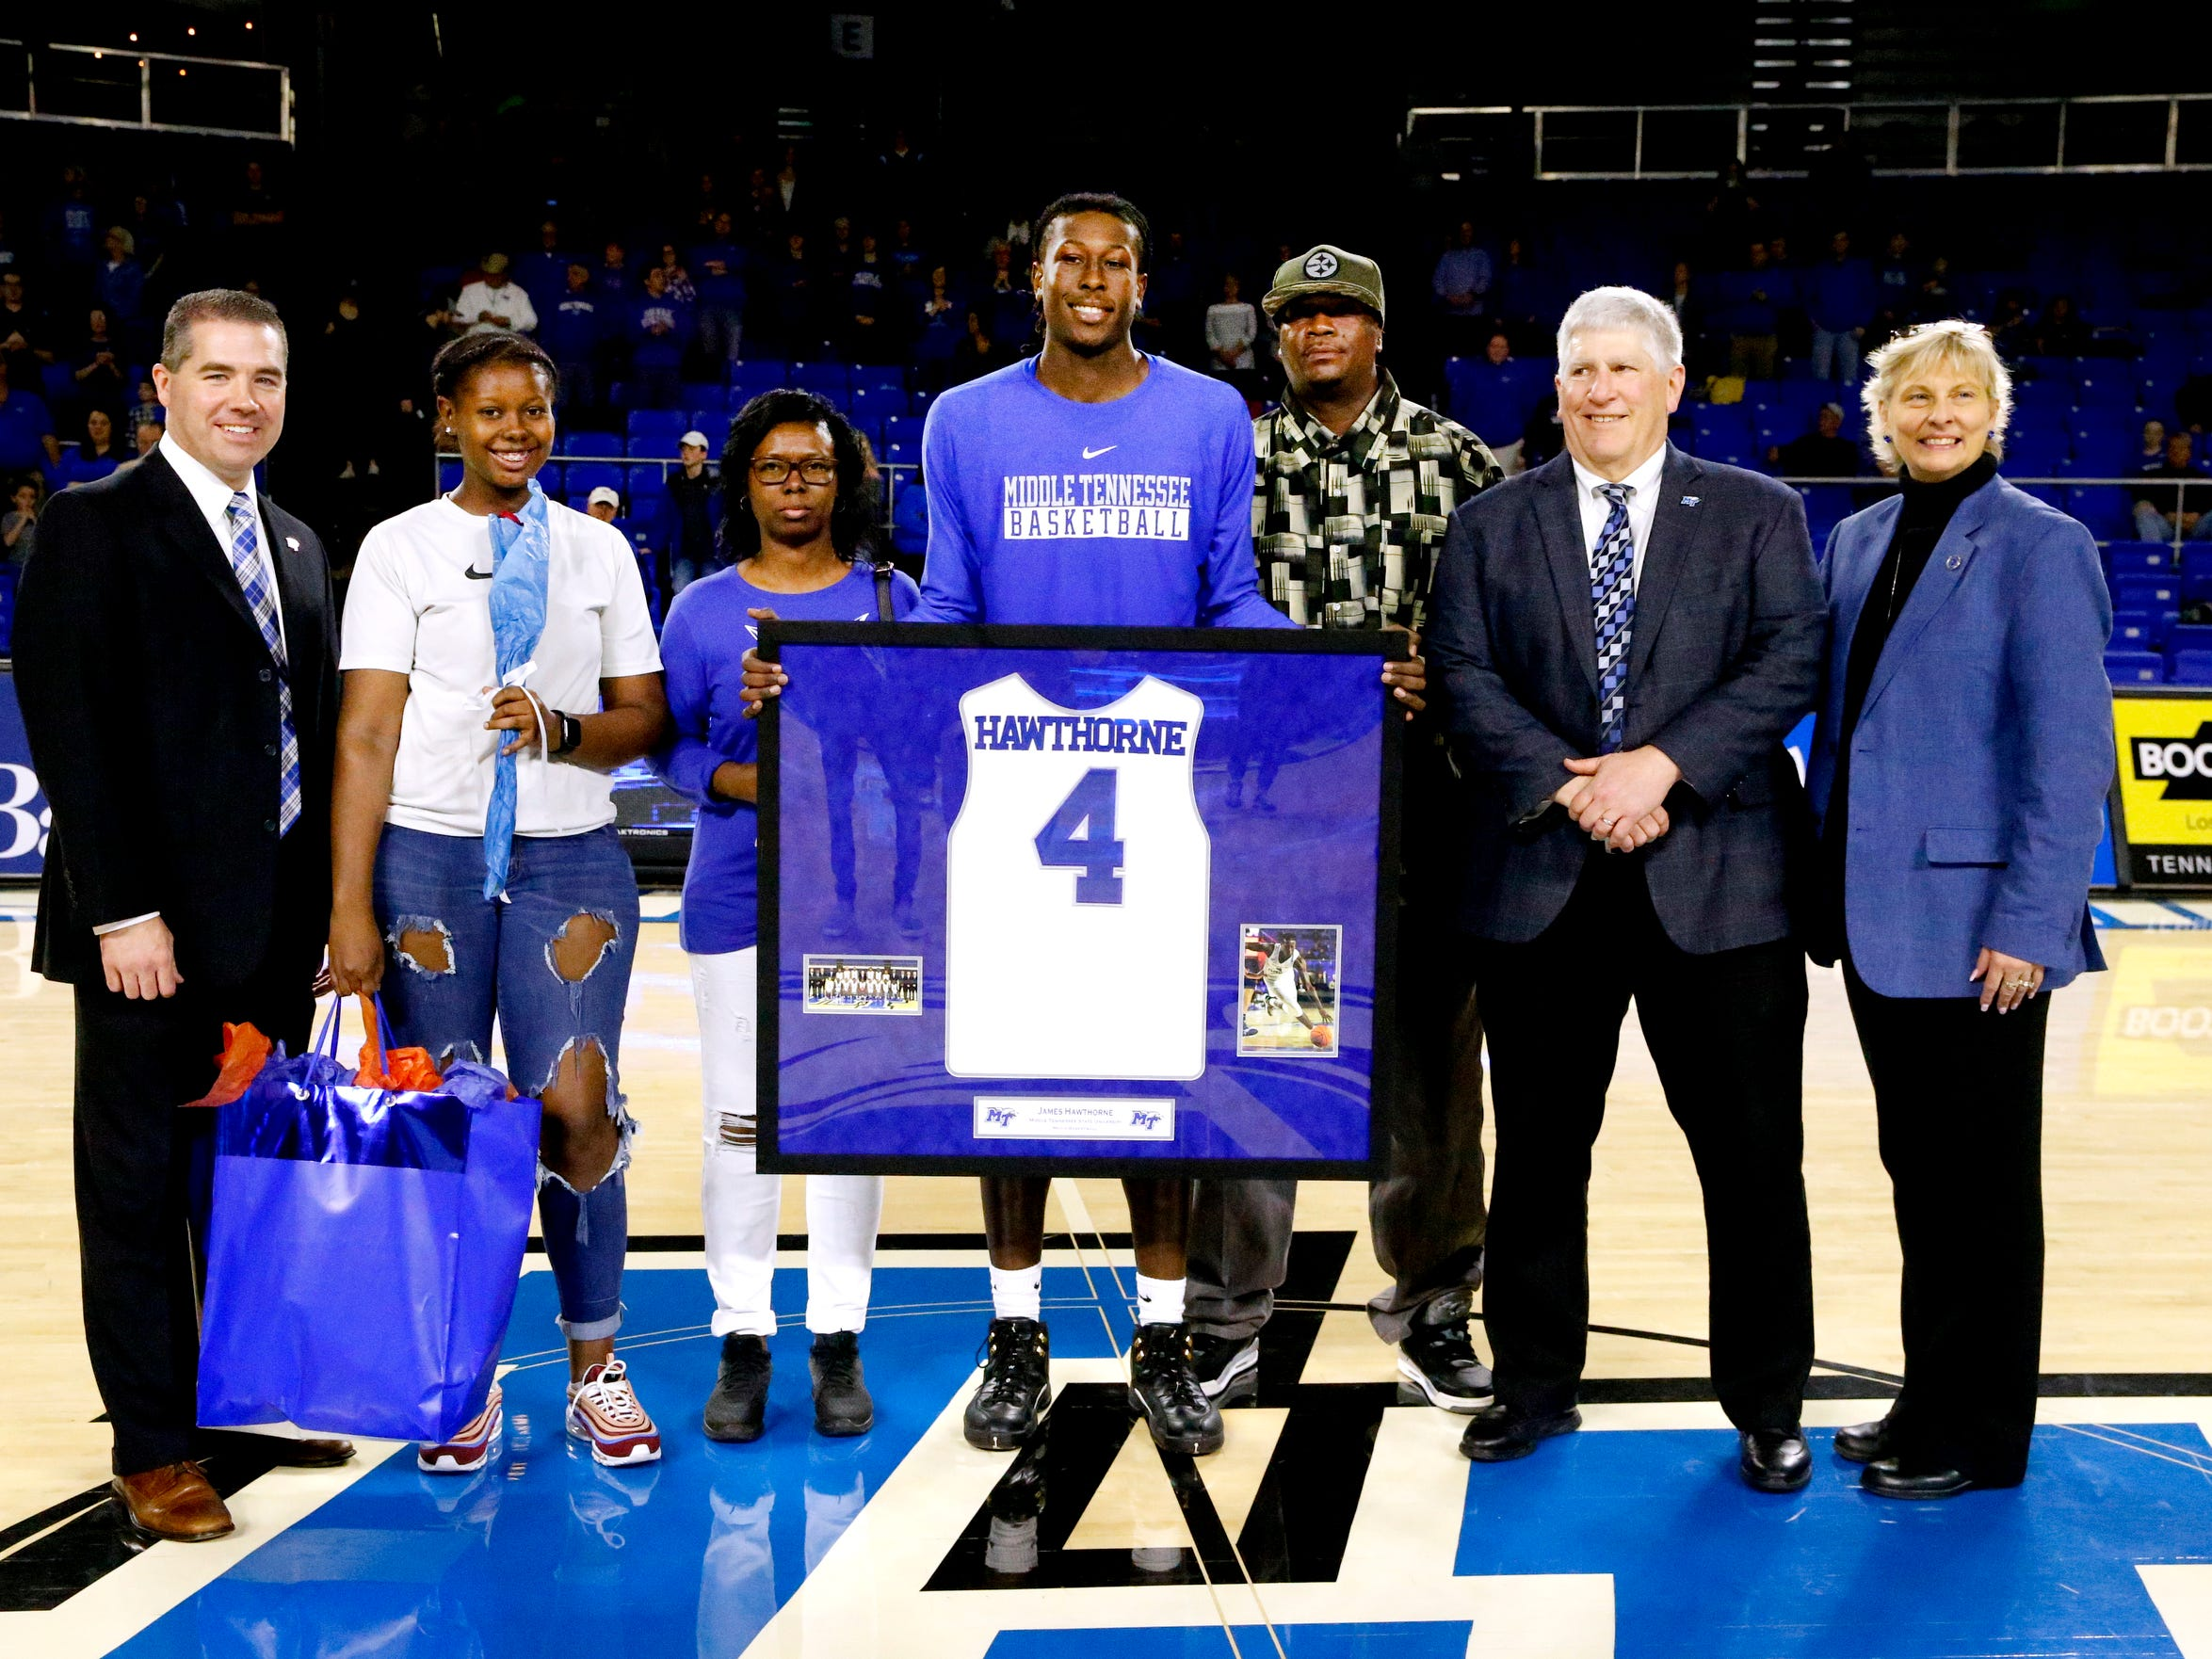 MTSU senior forward James Hawthorne (4) was honored during MTSU's senior night before the game against UTEP on Saturday, March 9, 2019, at Murphy Center in Murfreesboro, Tenn.